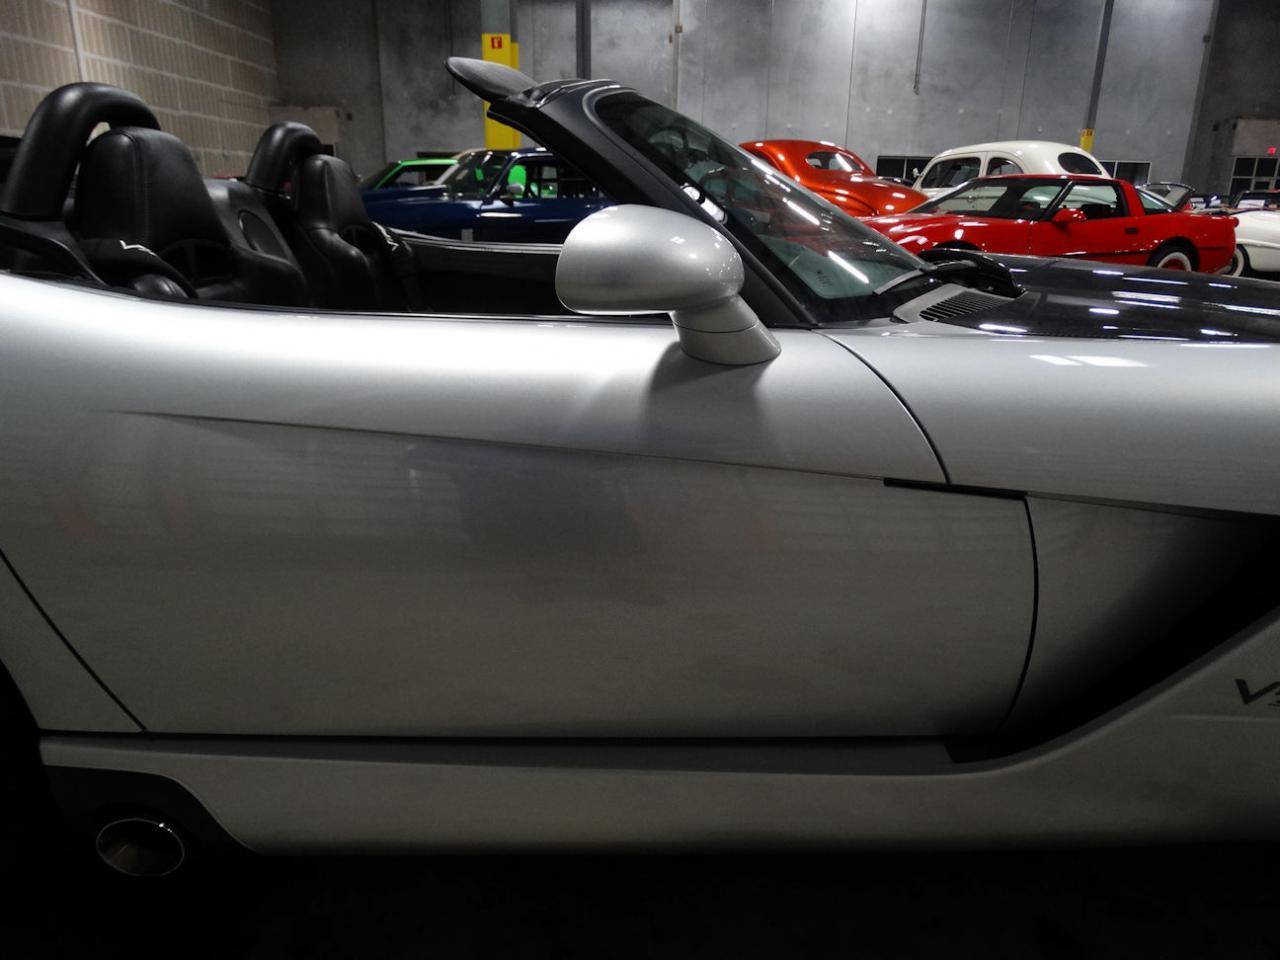 Large Picture of '04 Dodge Viper located in Florida - L6GU